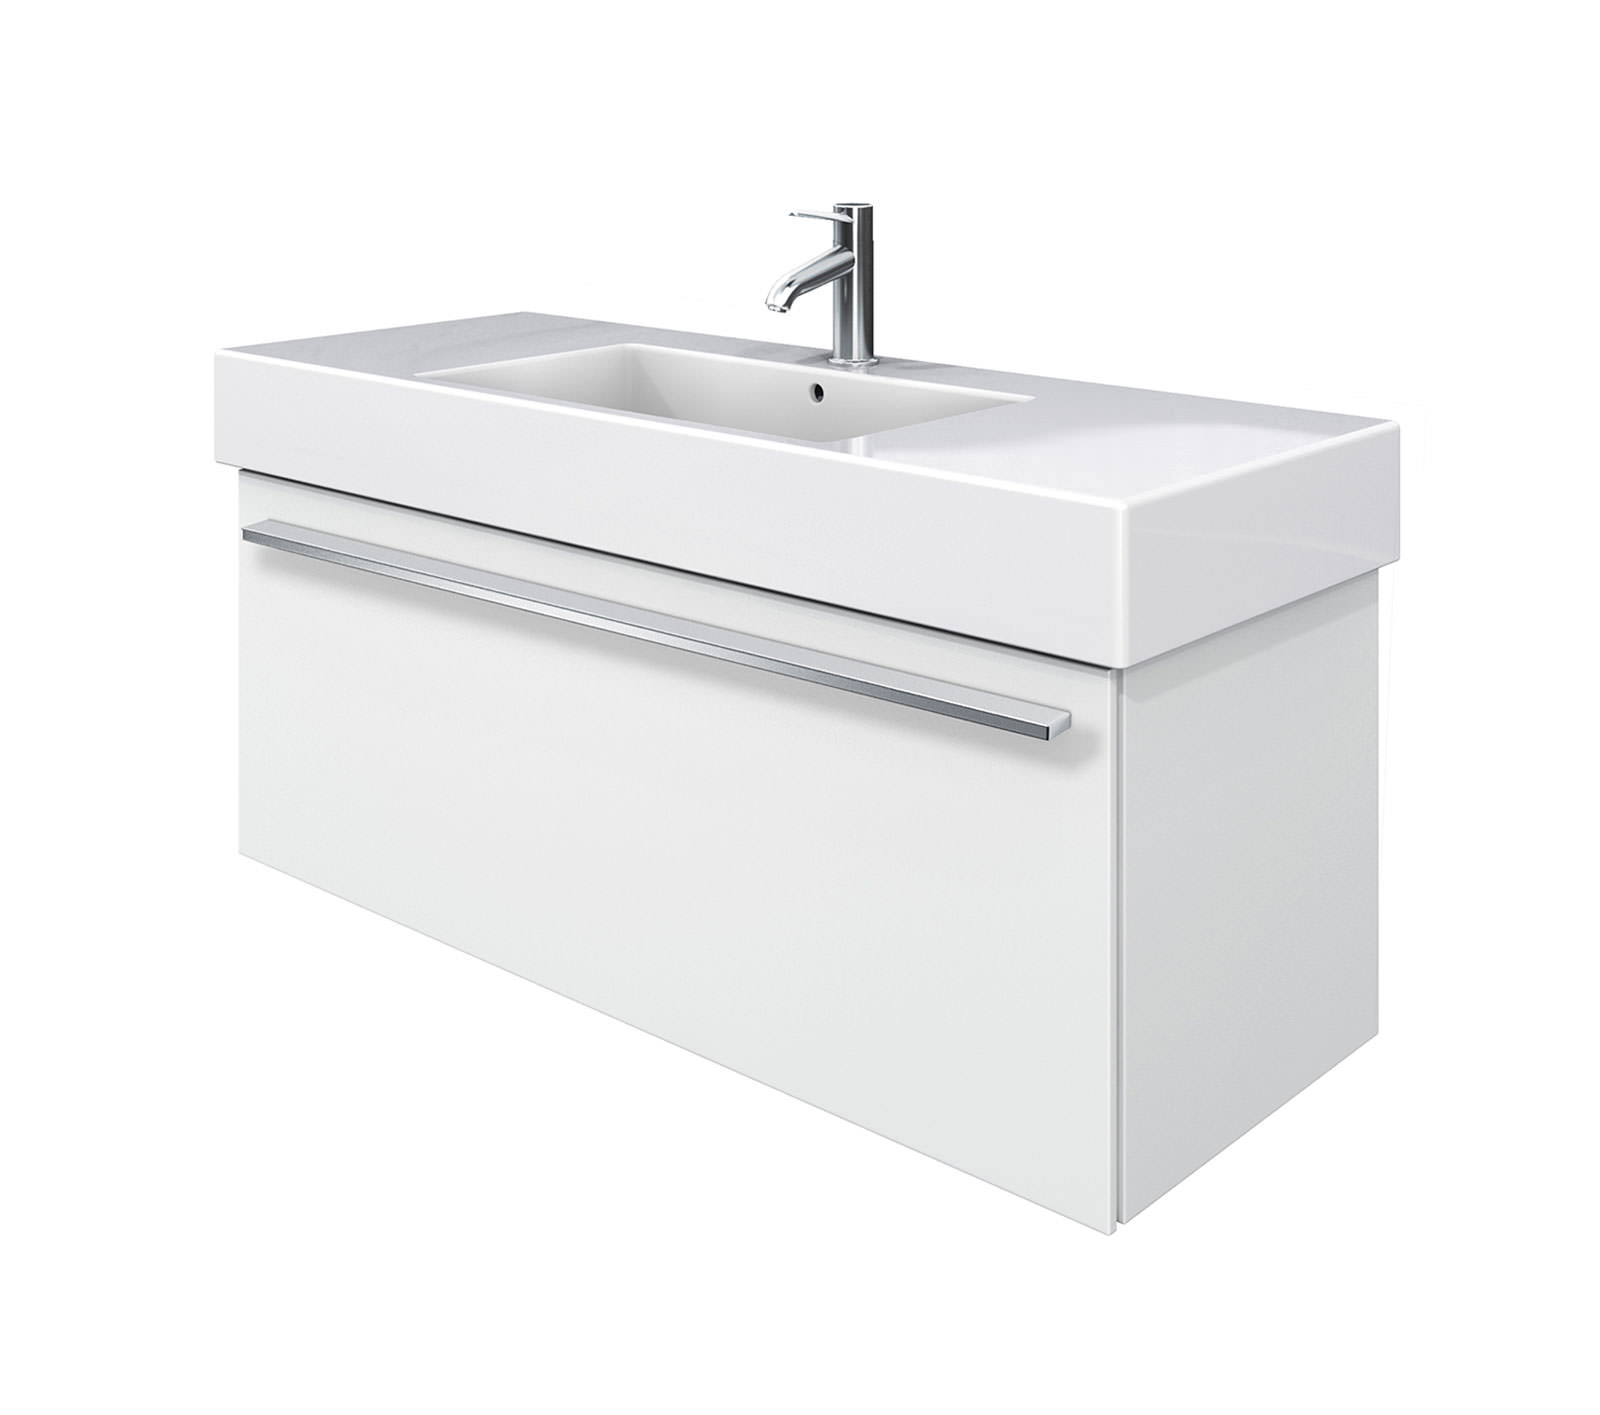 duravit x large 1200mm vanity unit with 1250mm vero washbasin xl605401818. Black Bedroom Furniture Sets. Home Design Ideas